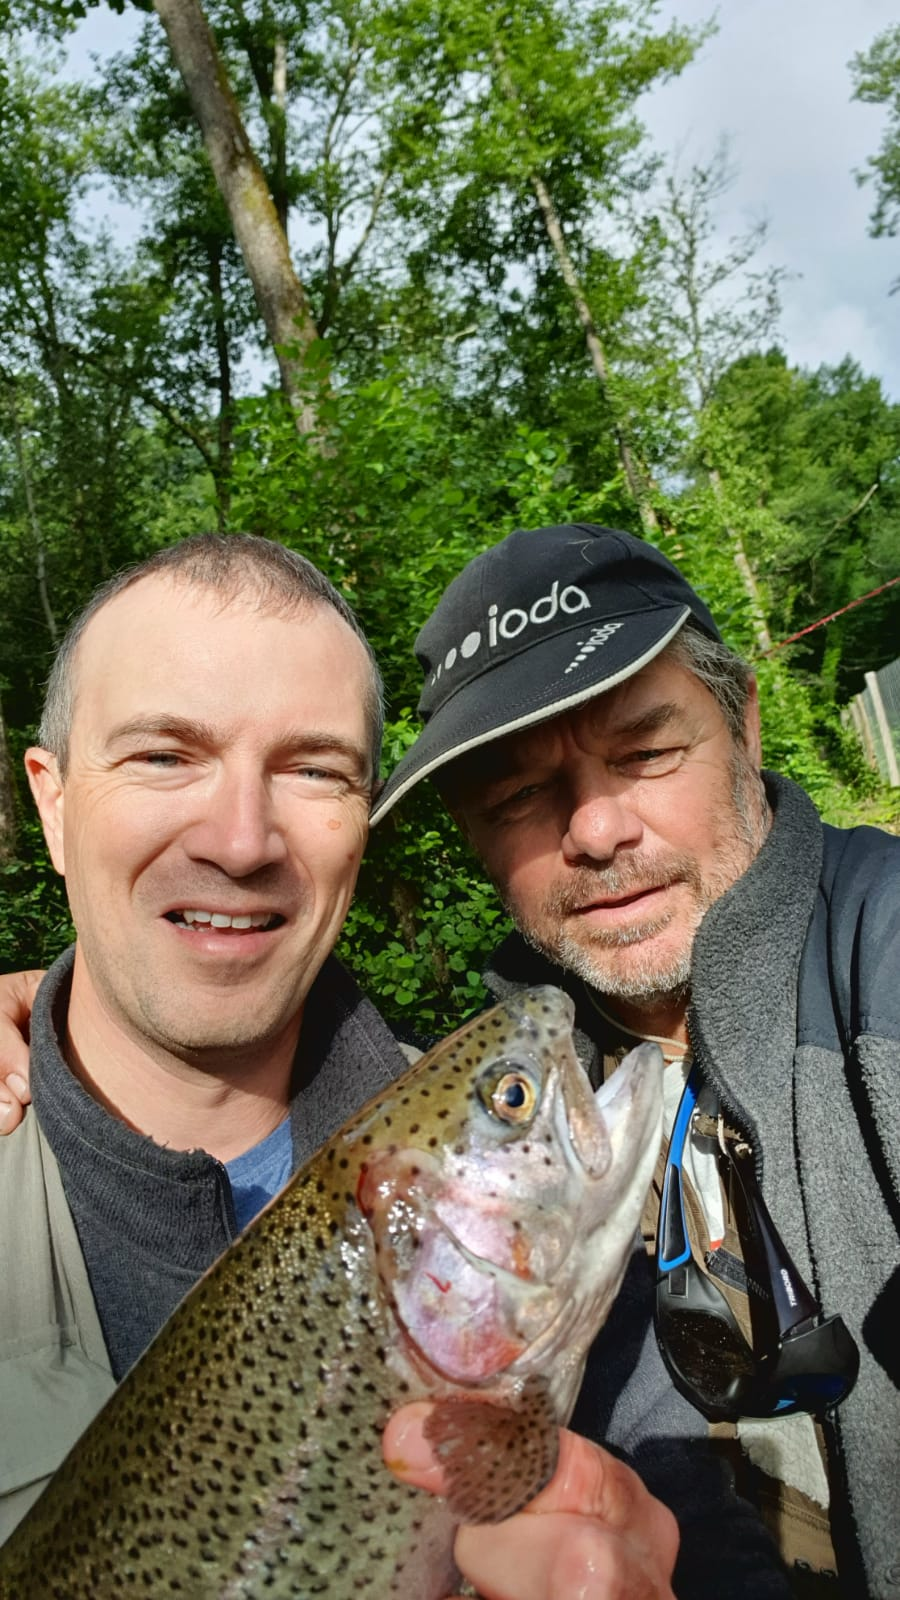 Reprise de la pêche  - Page 2 Ae829c10